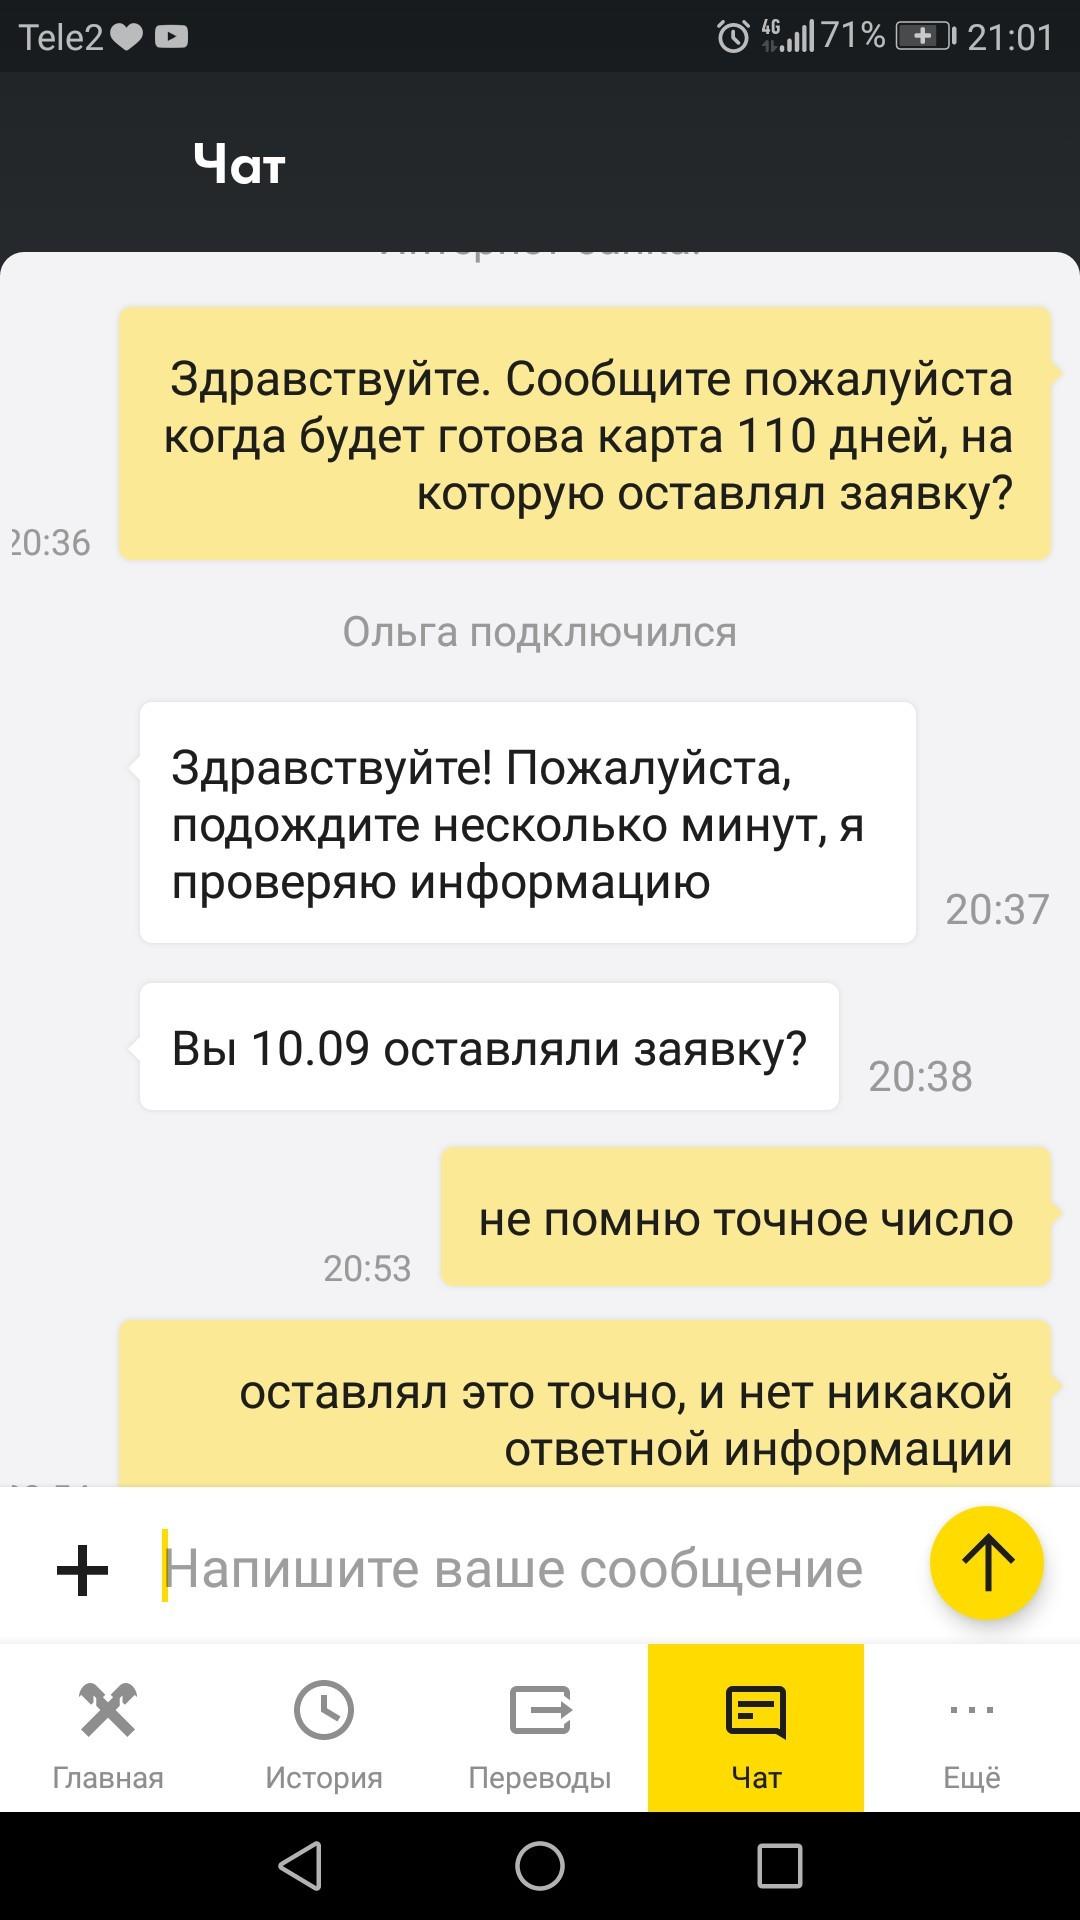 Займы до 100000 рублей на карту сроком на 12 месяцев